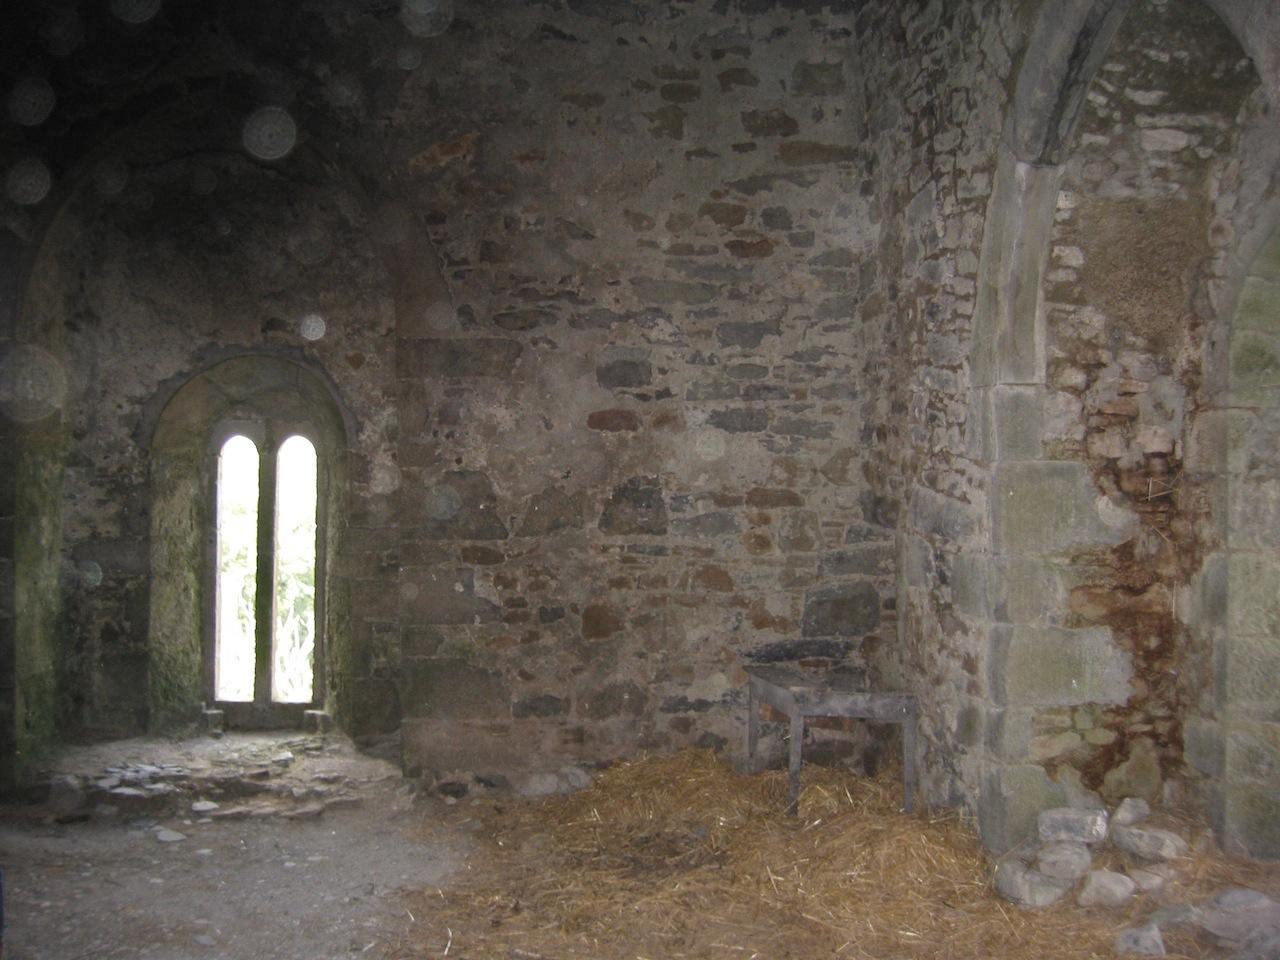 castles_ireland_3_3